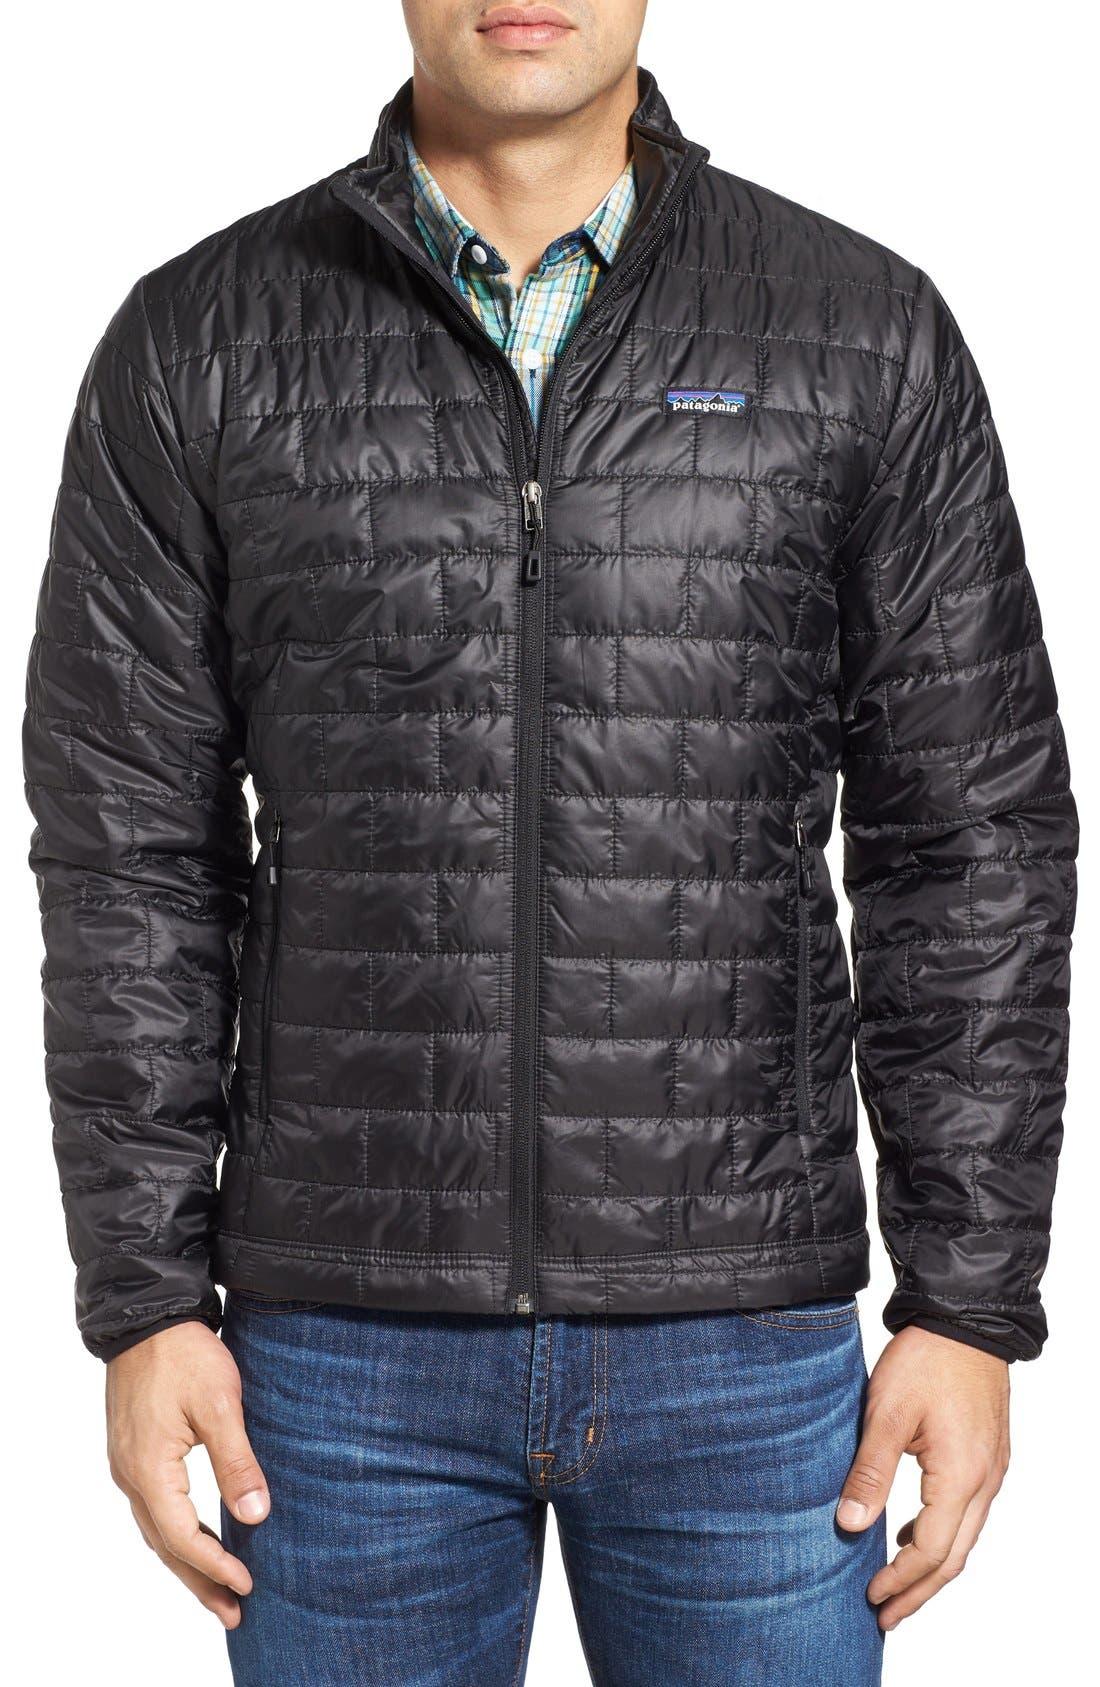 Alternate Image 1 Selected - Patagonia 'Nano Puff®' Water Resistant Jacket